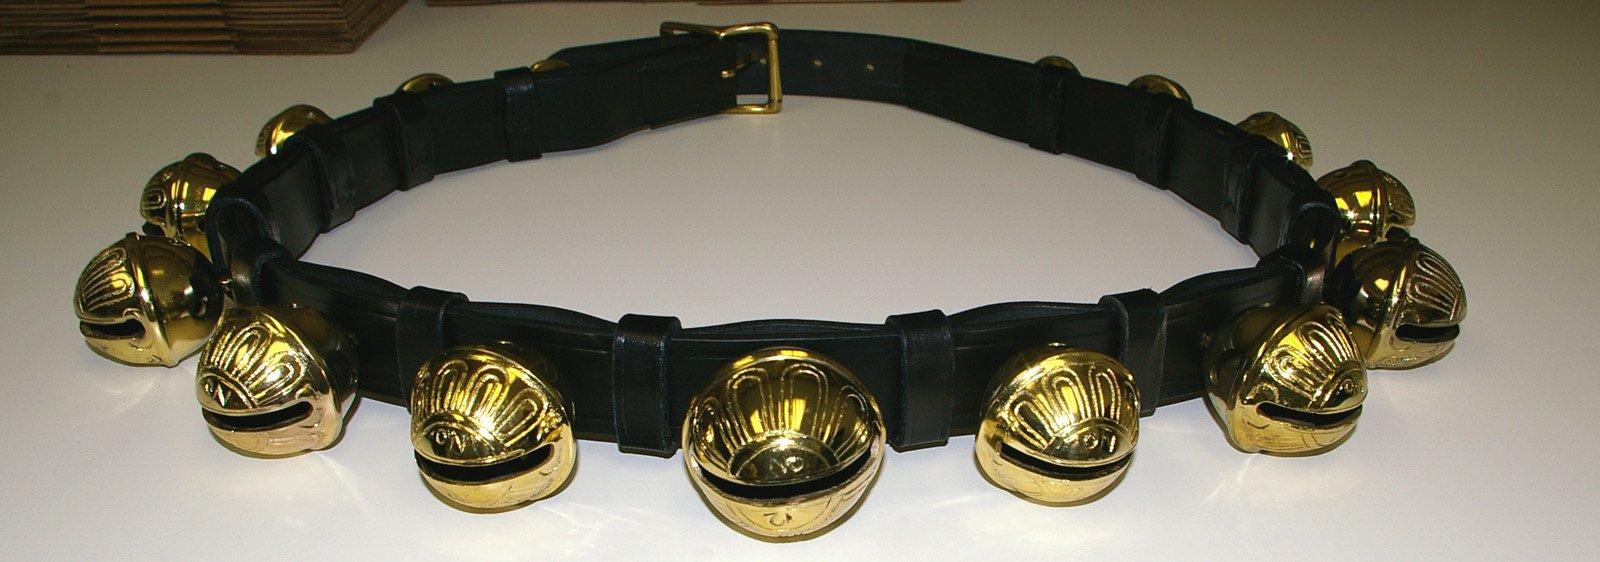 Premium 55 Inch Black Leather Brass Sleigh Bell Buckled Horse Strap Decoration